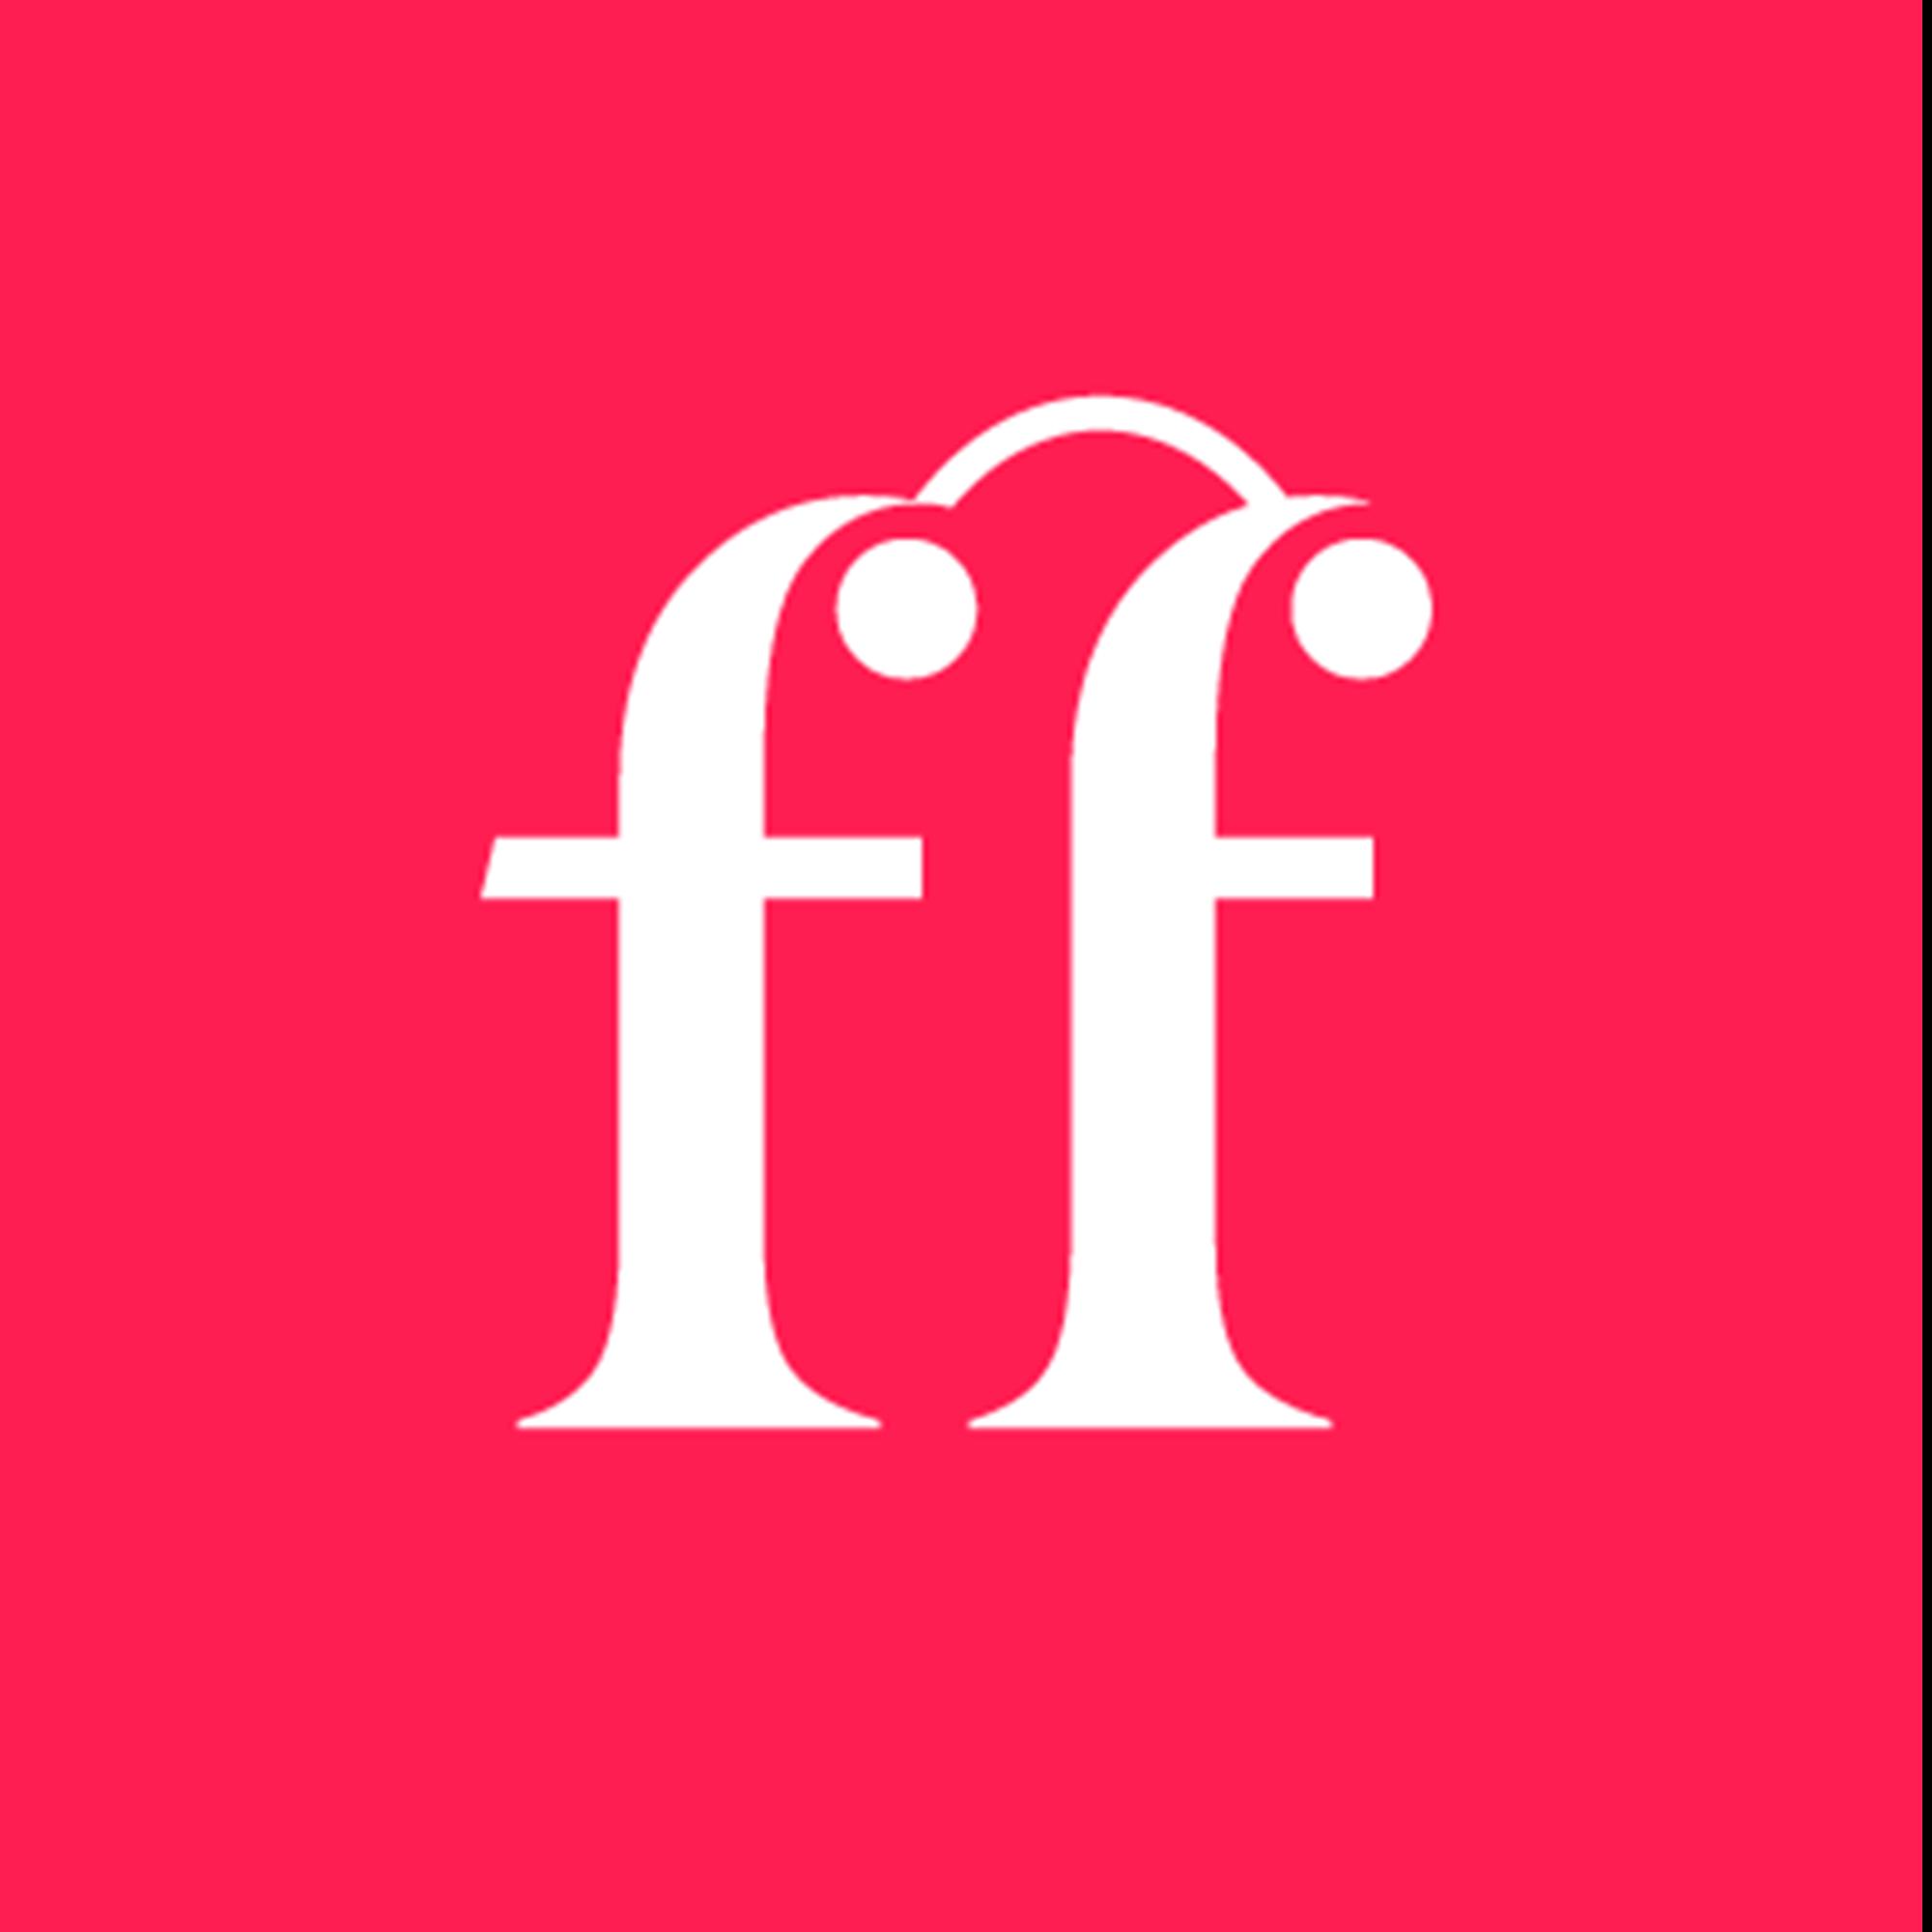 Framesfoundry logo